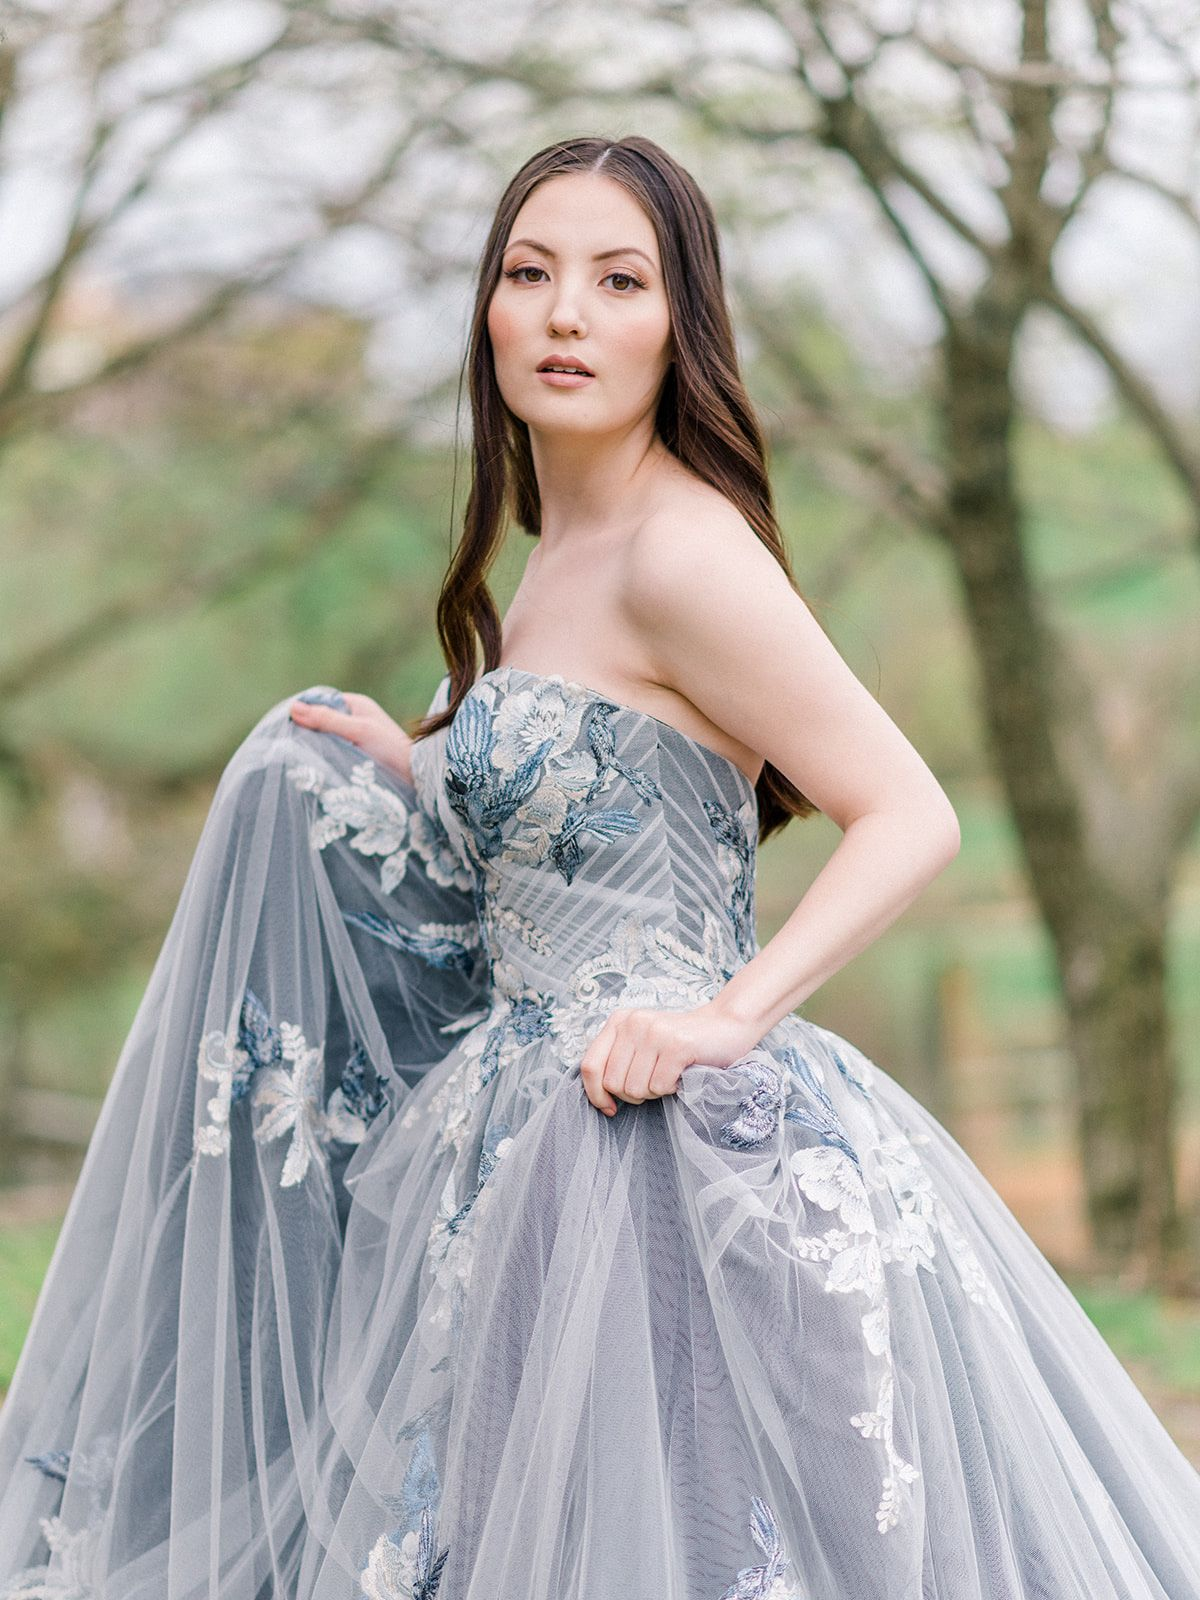 This Blue Ballgown Wedding Dress Is Giving Us Major Princess Vibes Ball Gown Wedding Dress Alternative Wedding Dresses Ball Gowns Wedding [ 1600 x 1200 Pixel ]